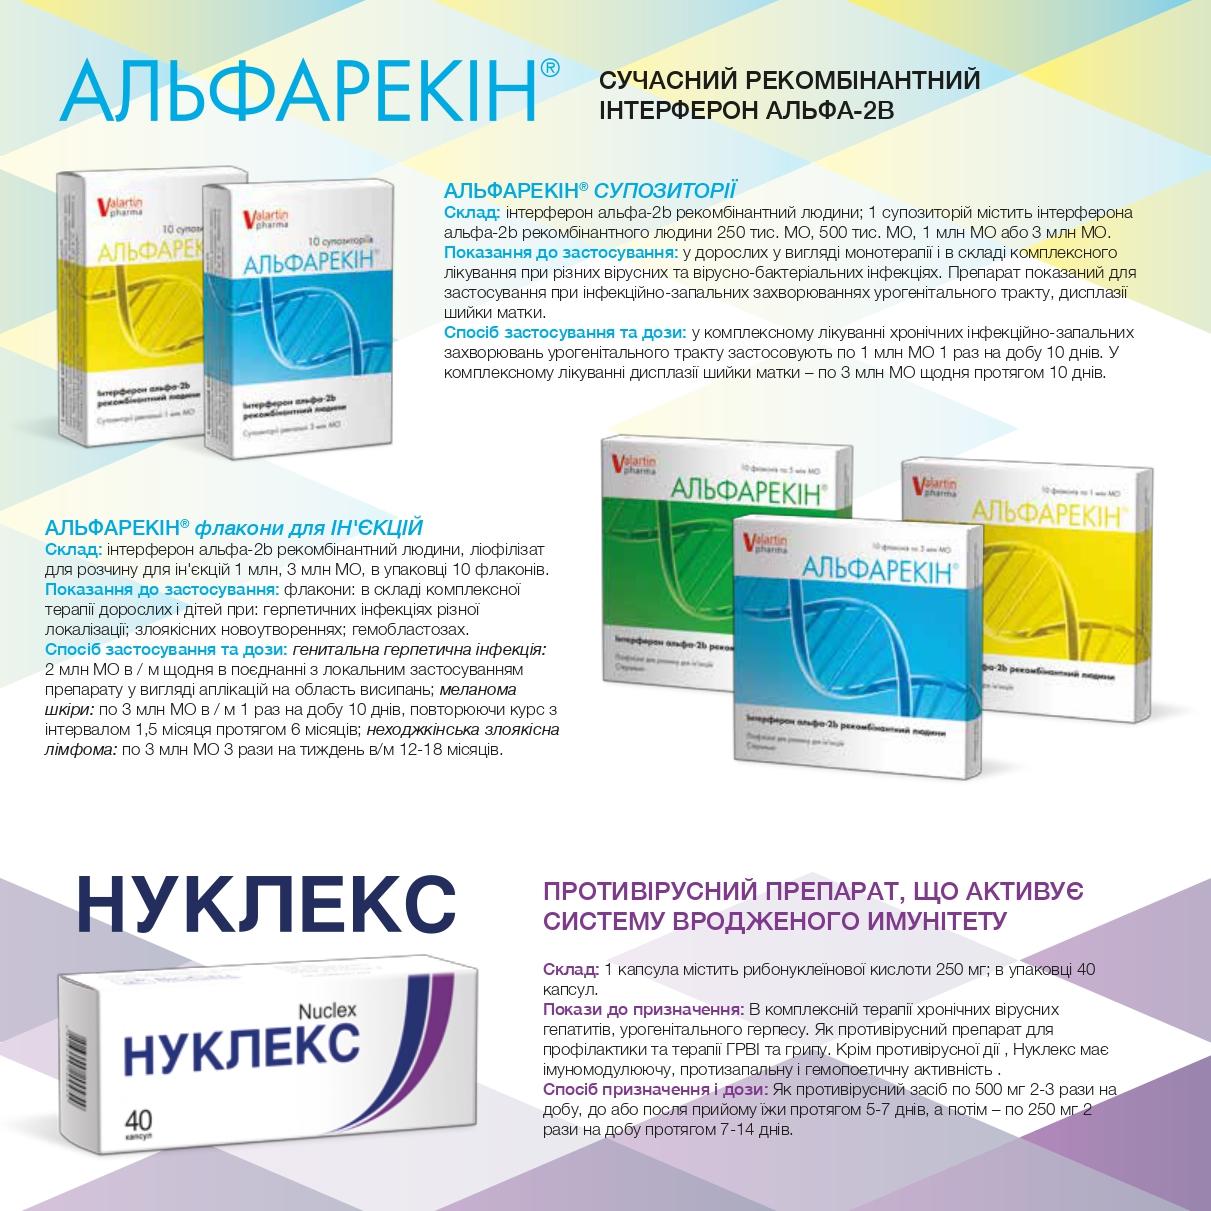 общии_ буклет205x205 2019_page-0004